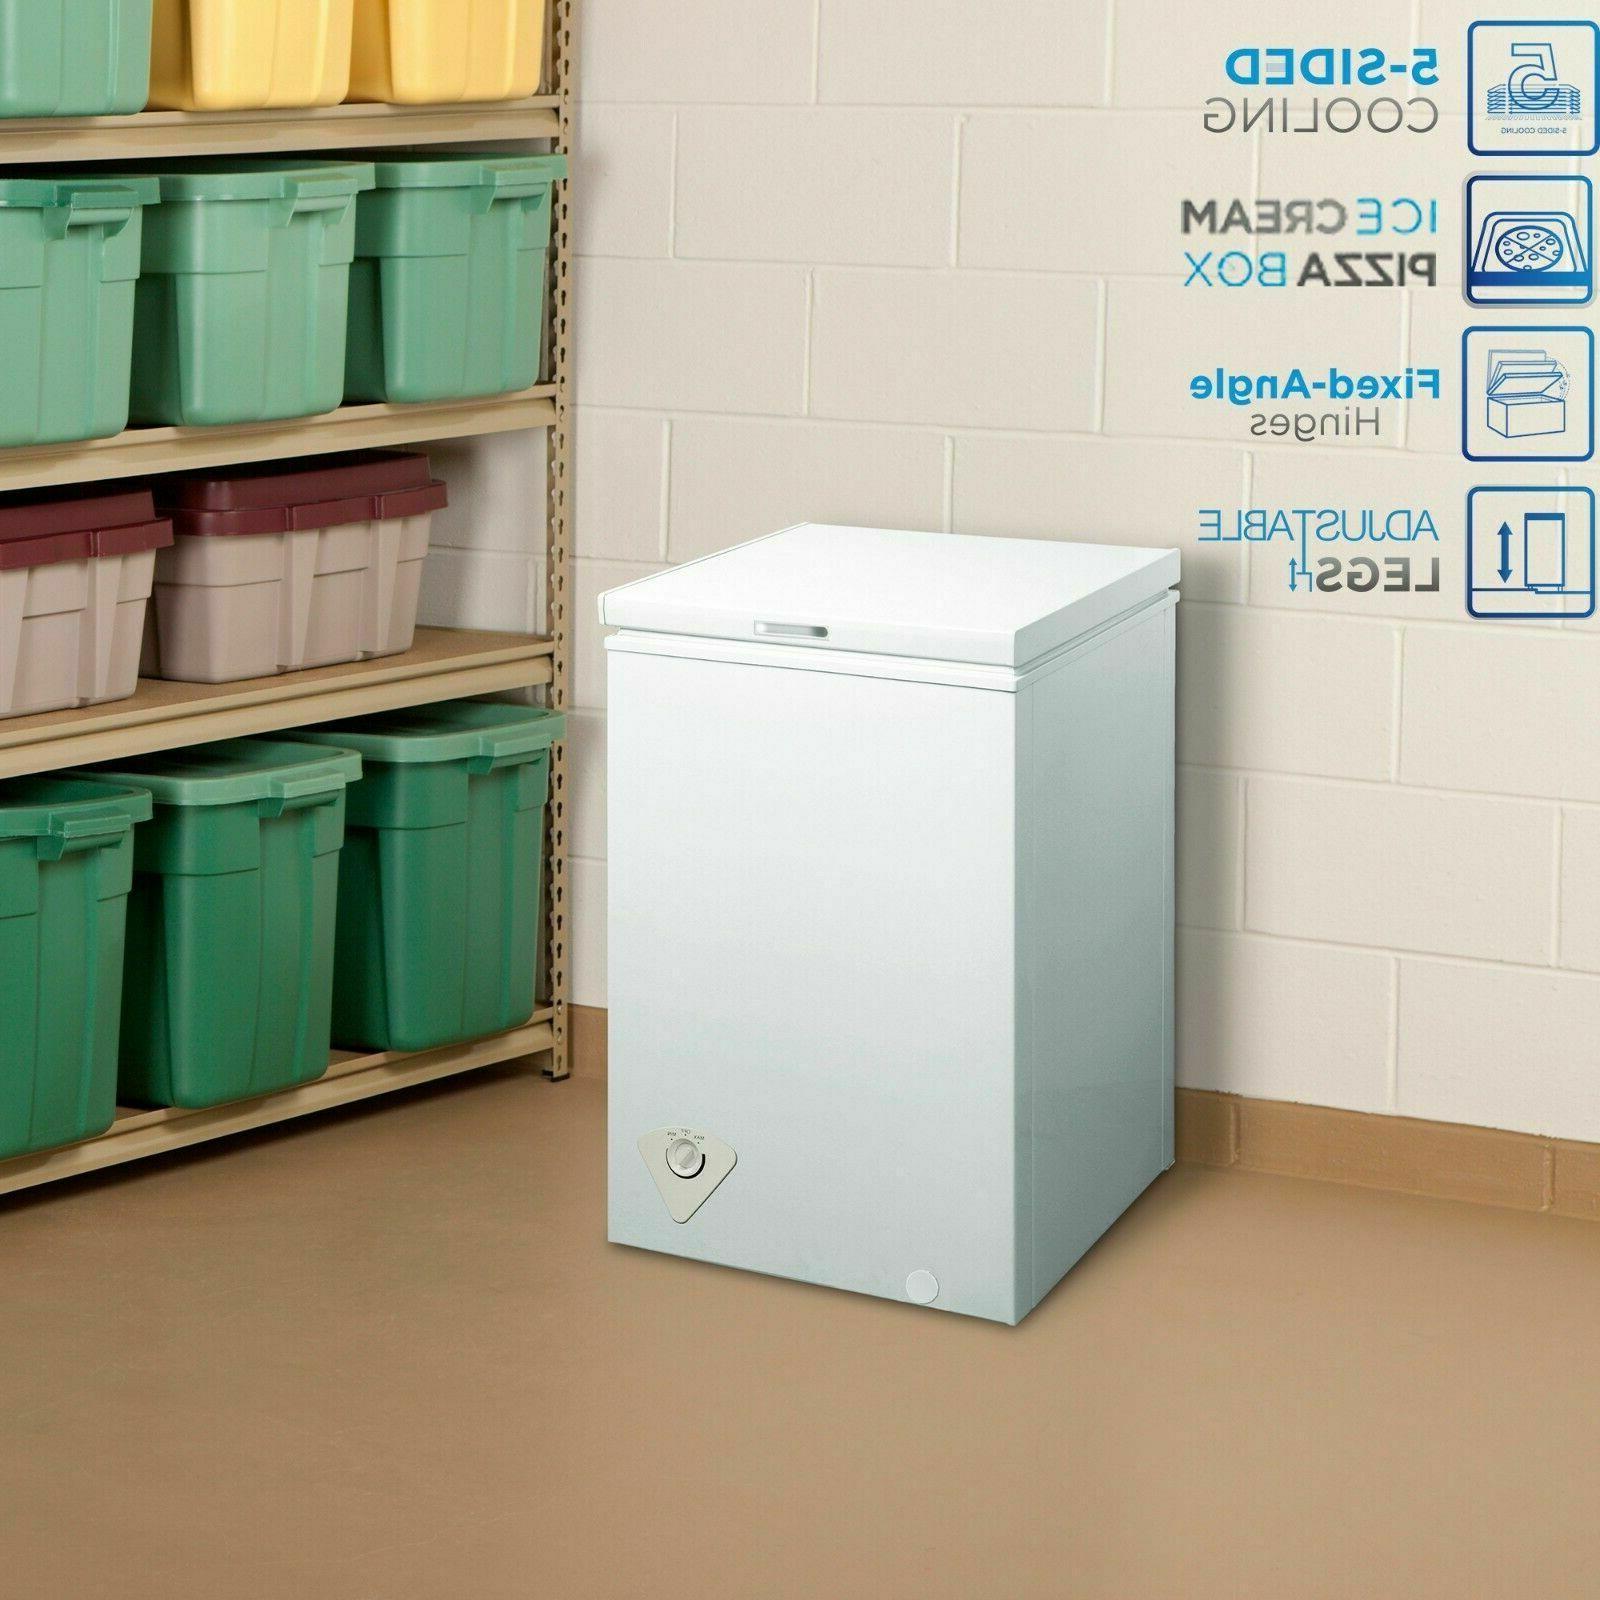 Smad Chest Water Garage Energy-saving